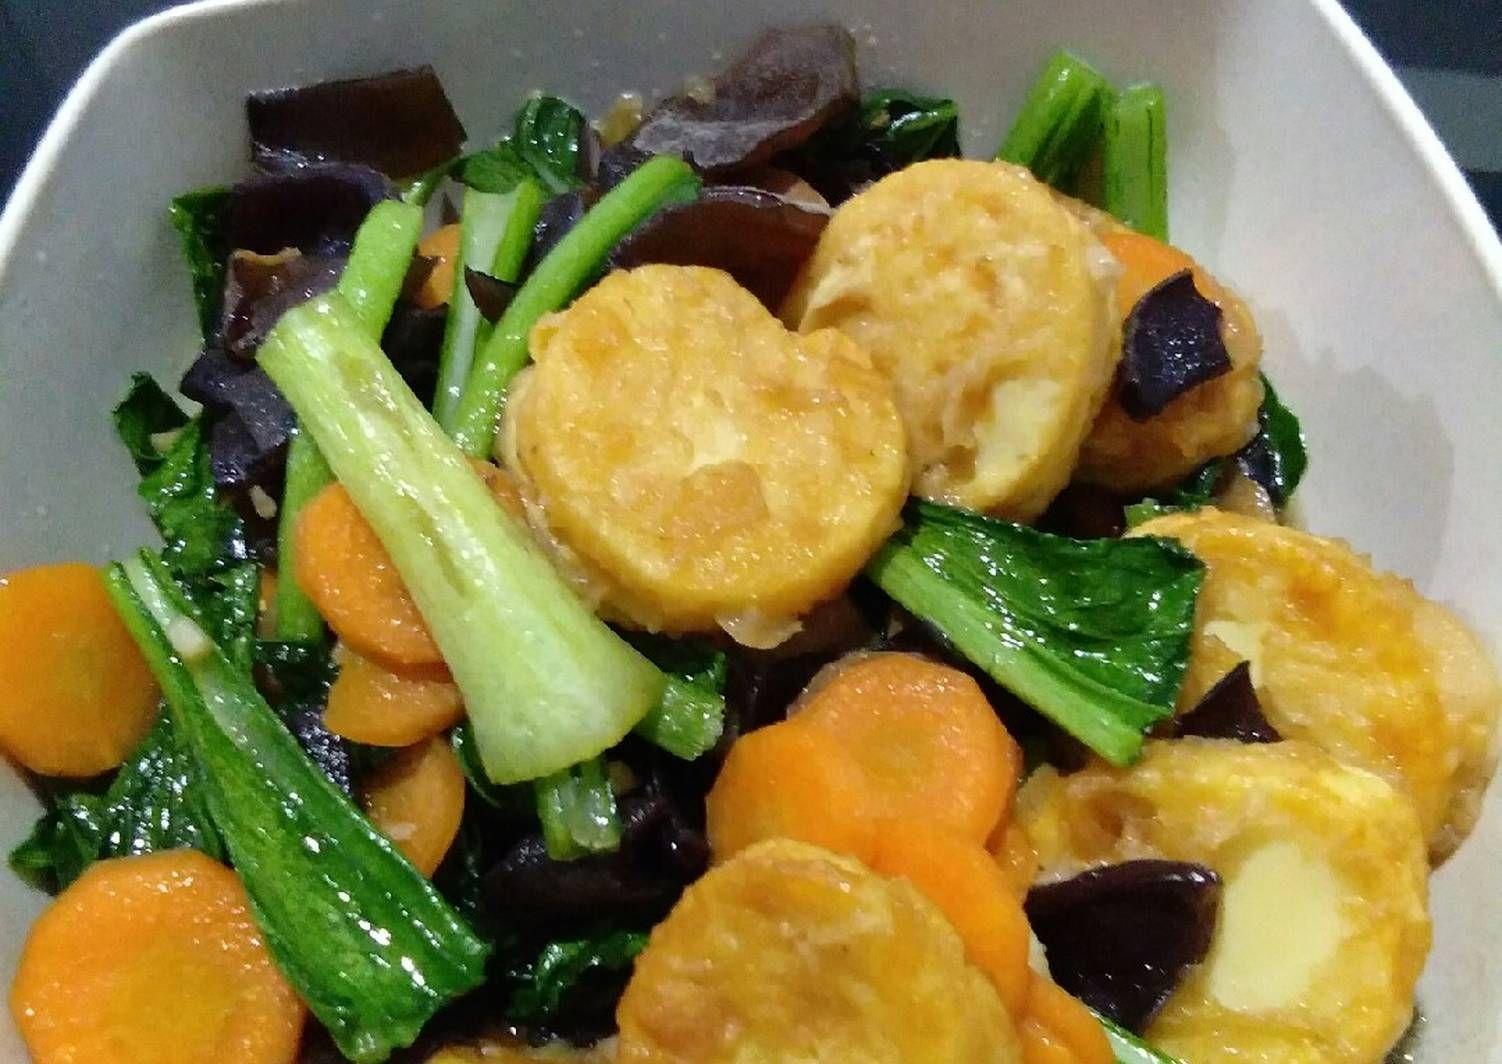 Resep Capcay Tumis Sayuran Oleh Neng Mia Resep Tumis Makanan Babi Asam Manis